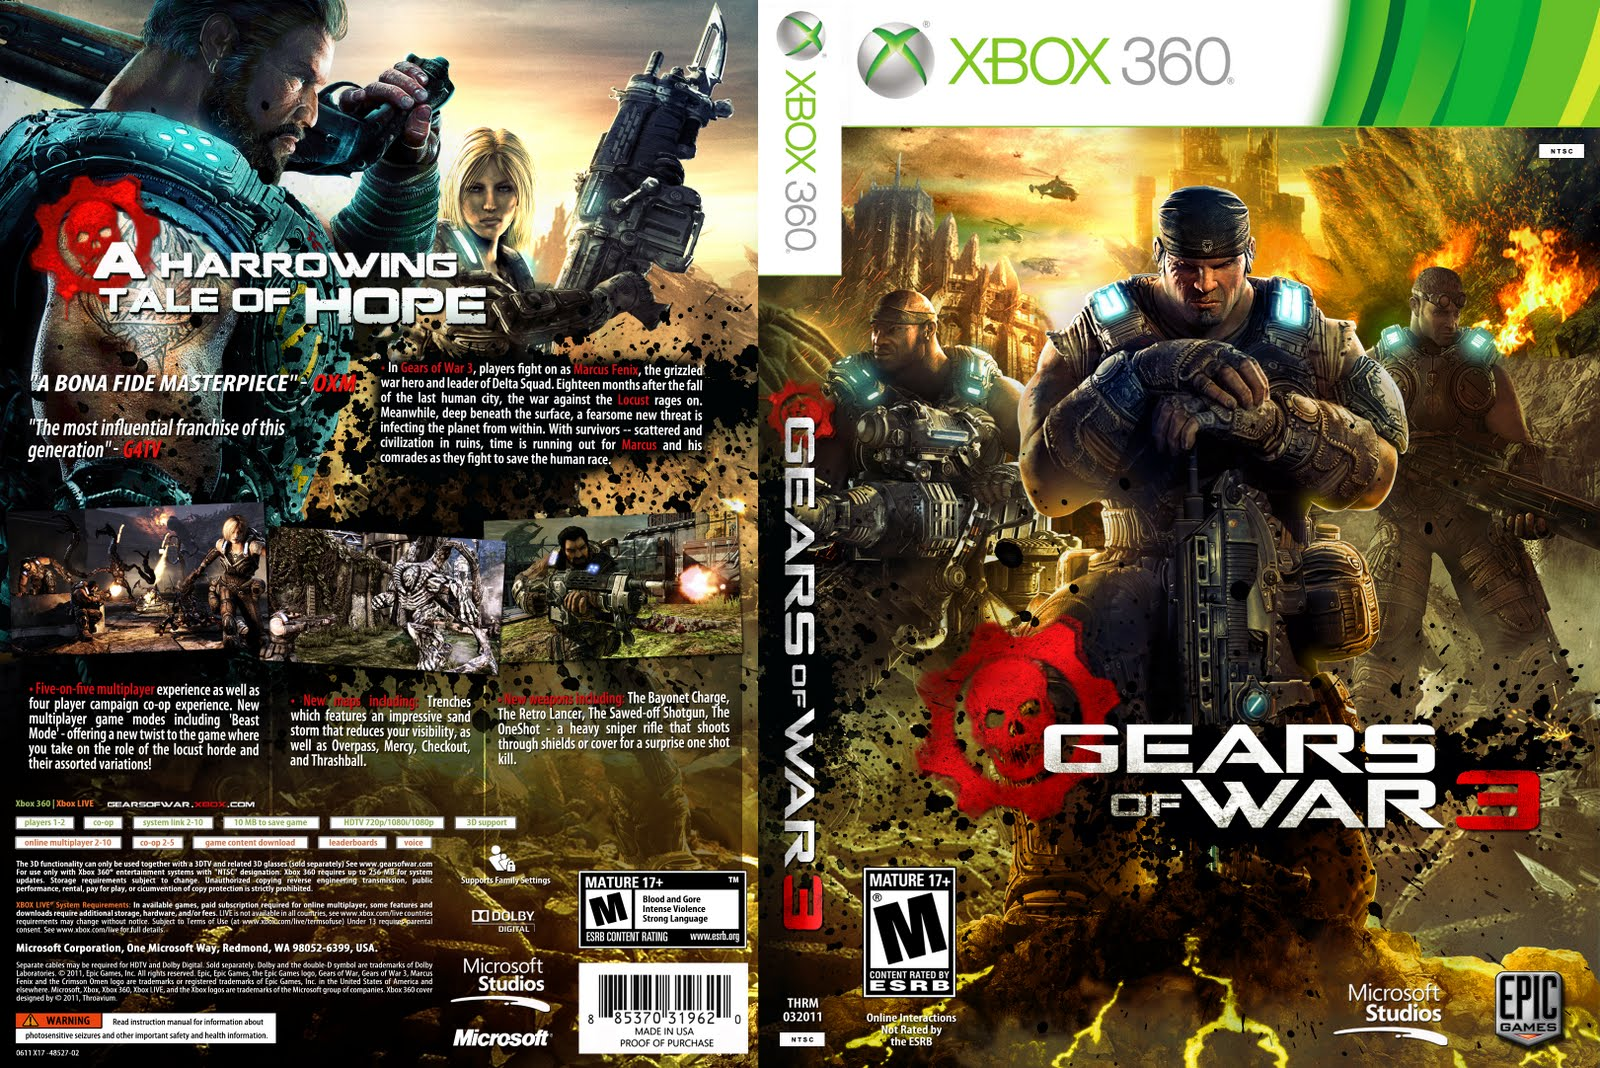 Gears Of War Judgement Wallpaper Hd Games Covers Cover Gears Of War 3 Xbox 360